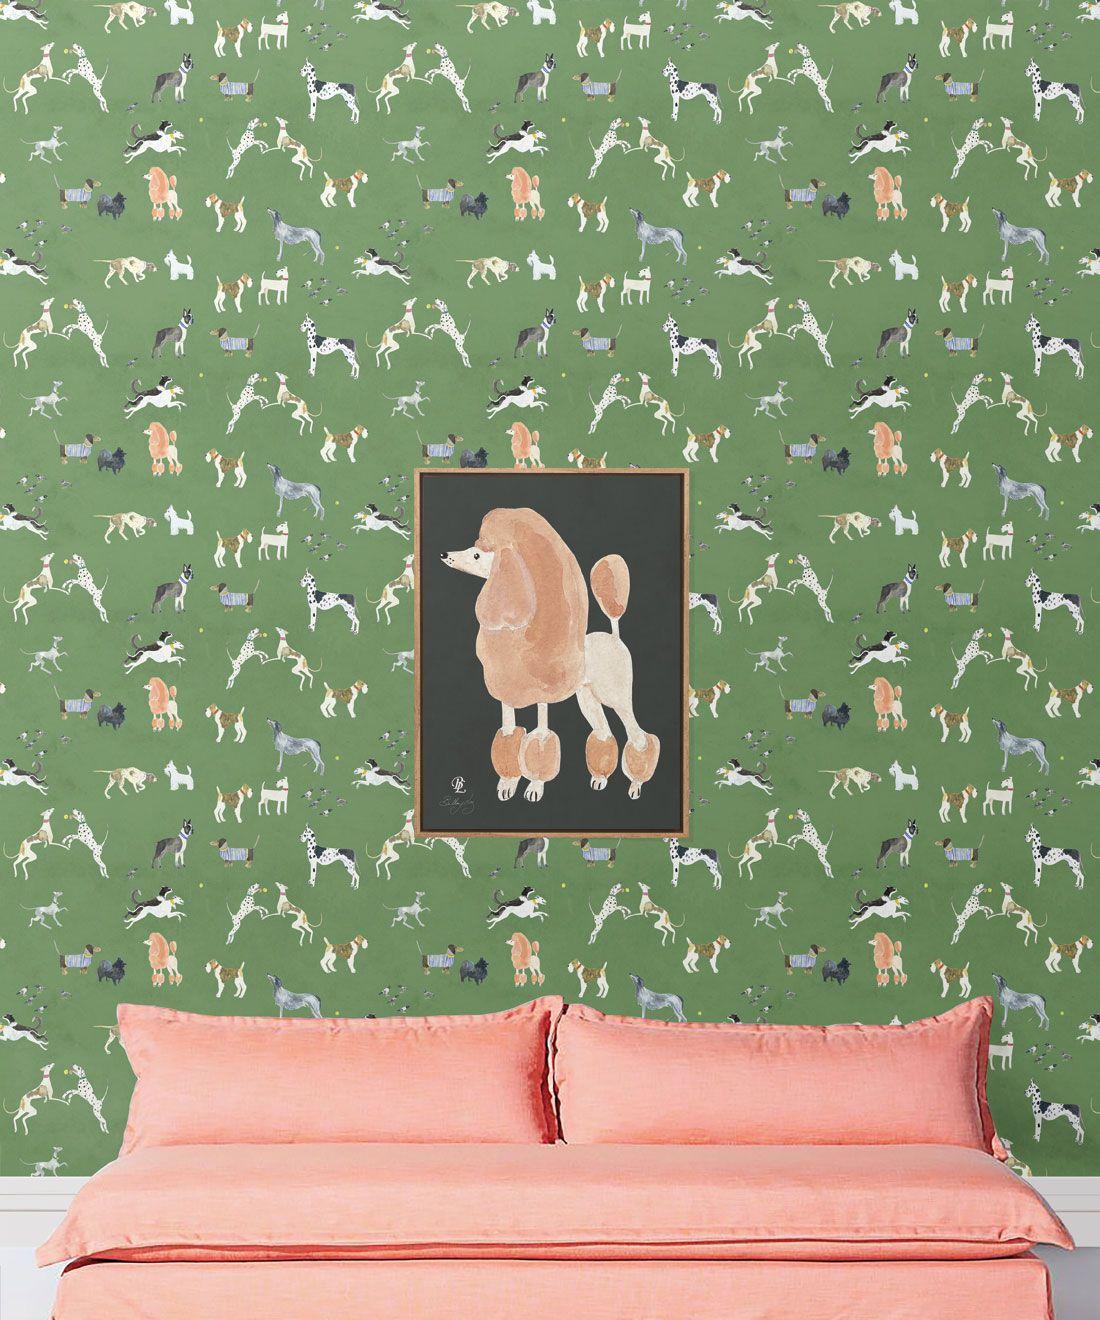 Doggies Wallpaper •Dog Wallpaper •Green • insitu witih sofa